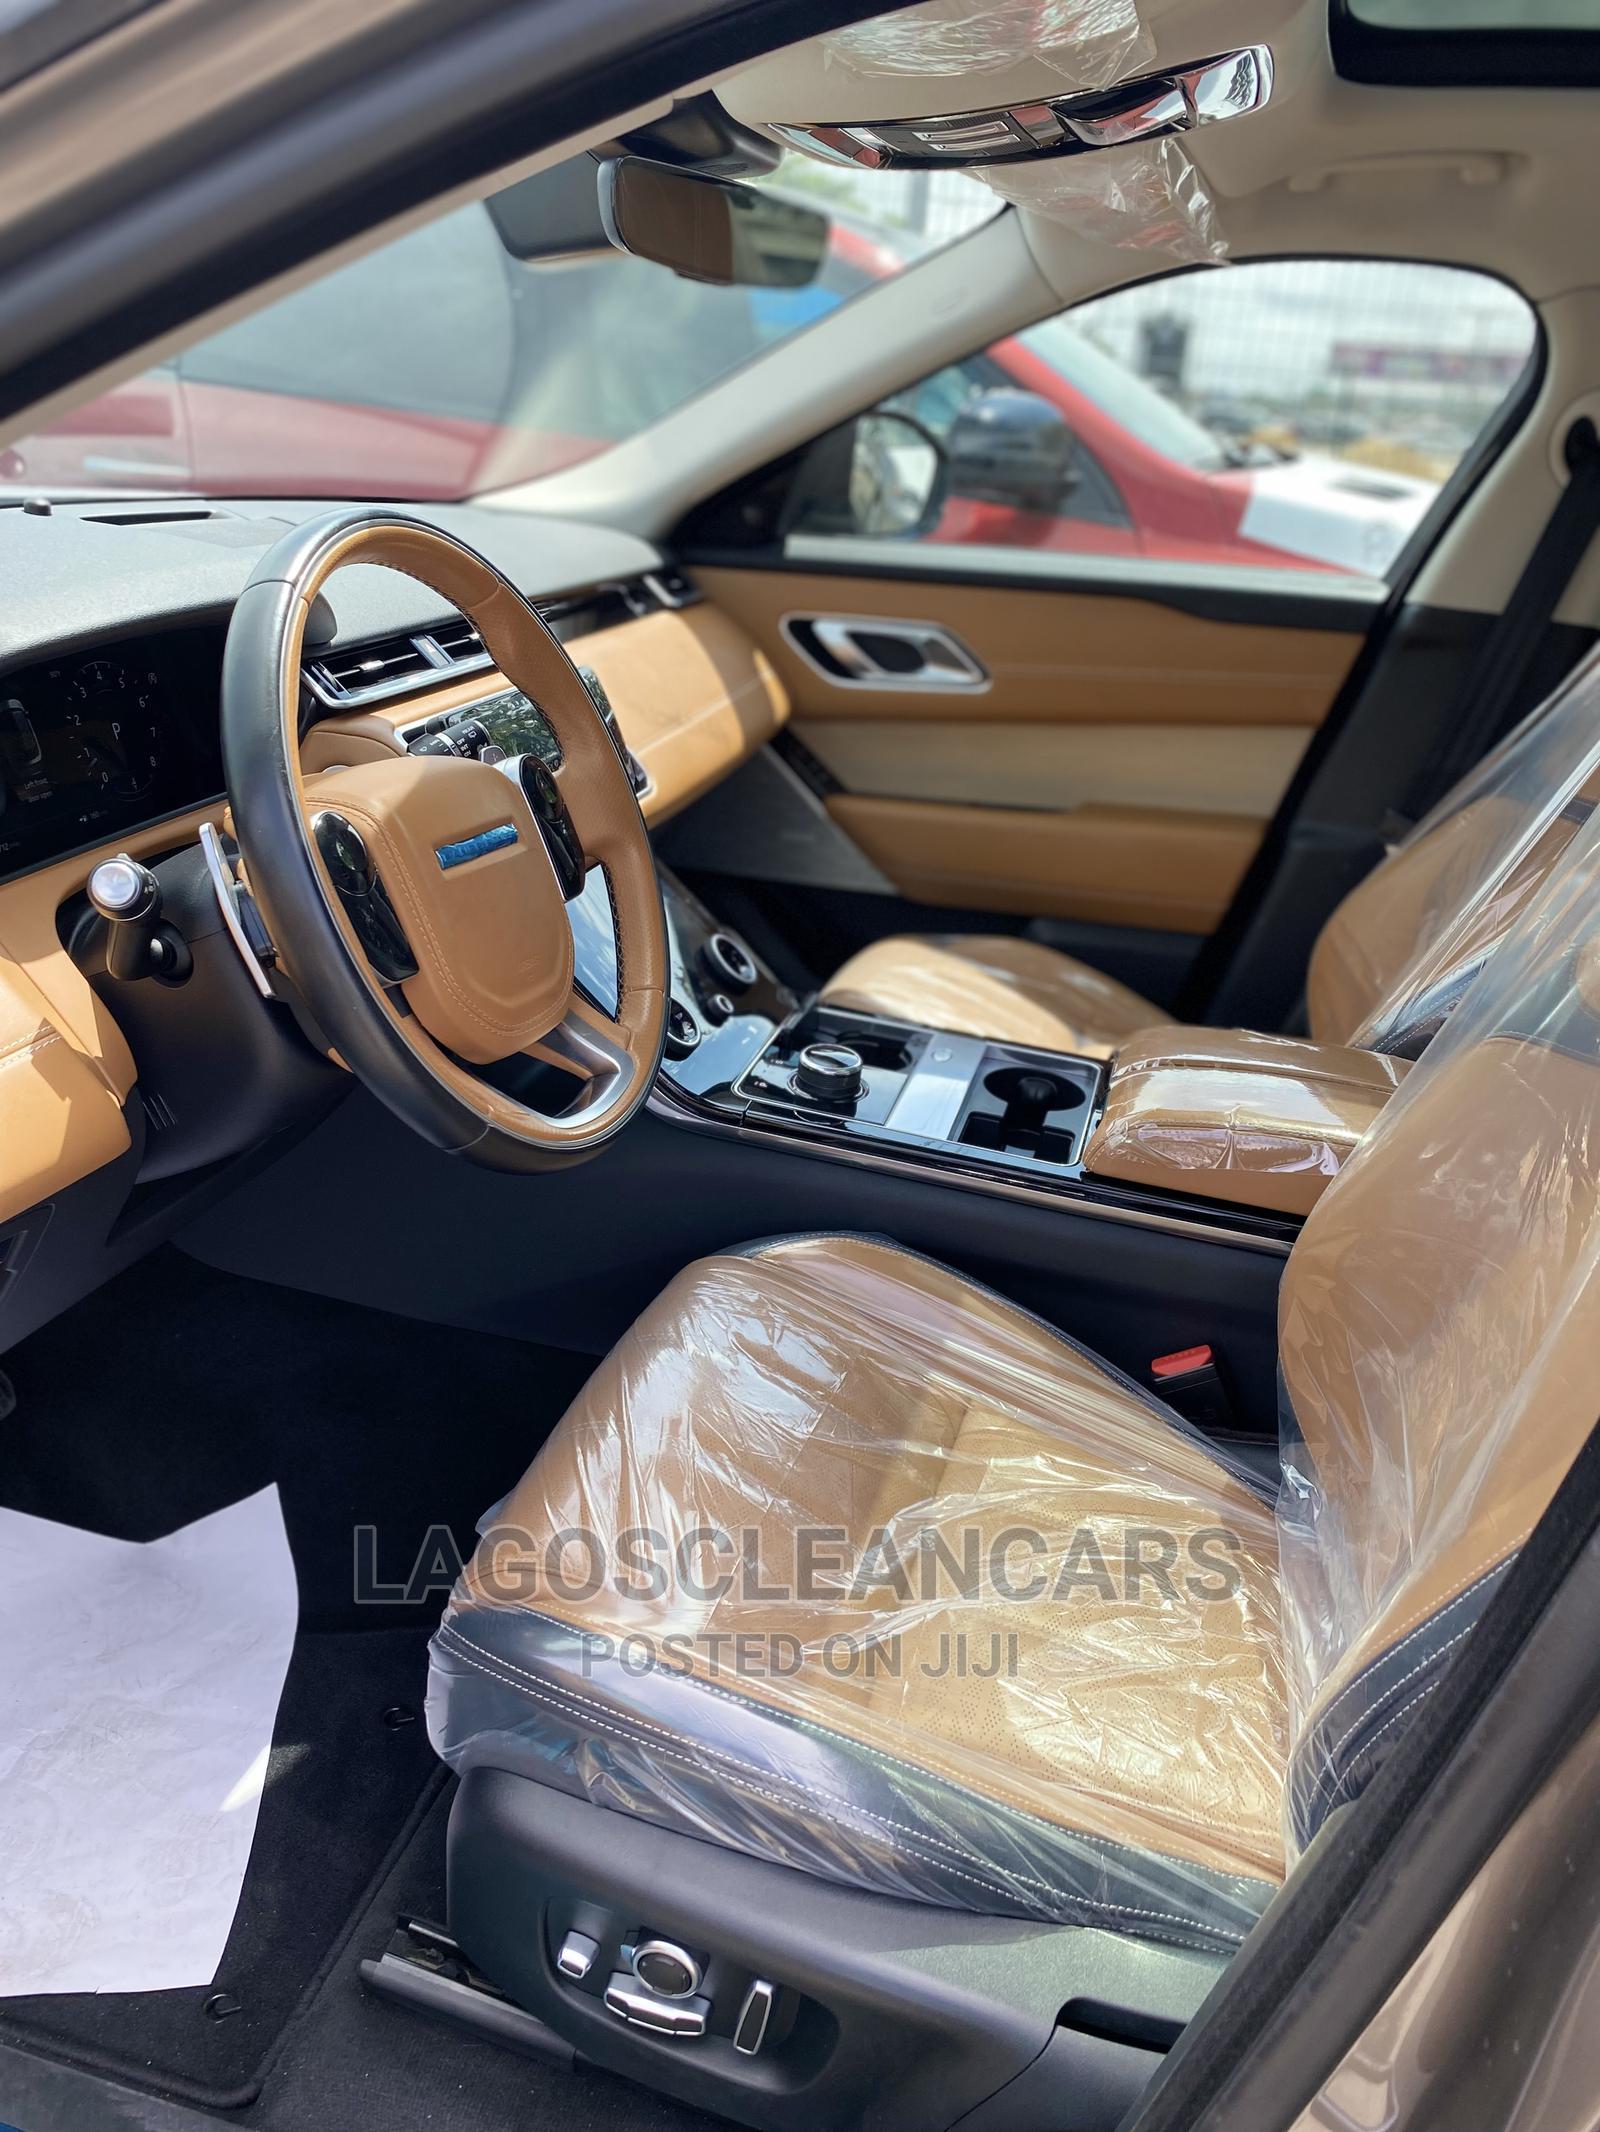 Land Rover Range Rover Velar 2018 P380 HSE R-Dynamic 4x4 Brown | Cars for sale in Lekki, Lagos State, Nigeria